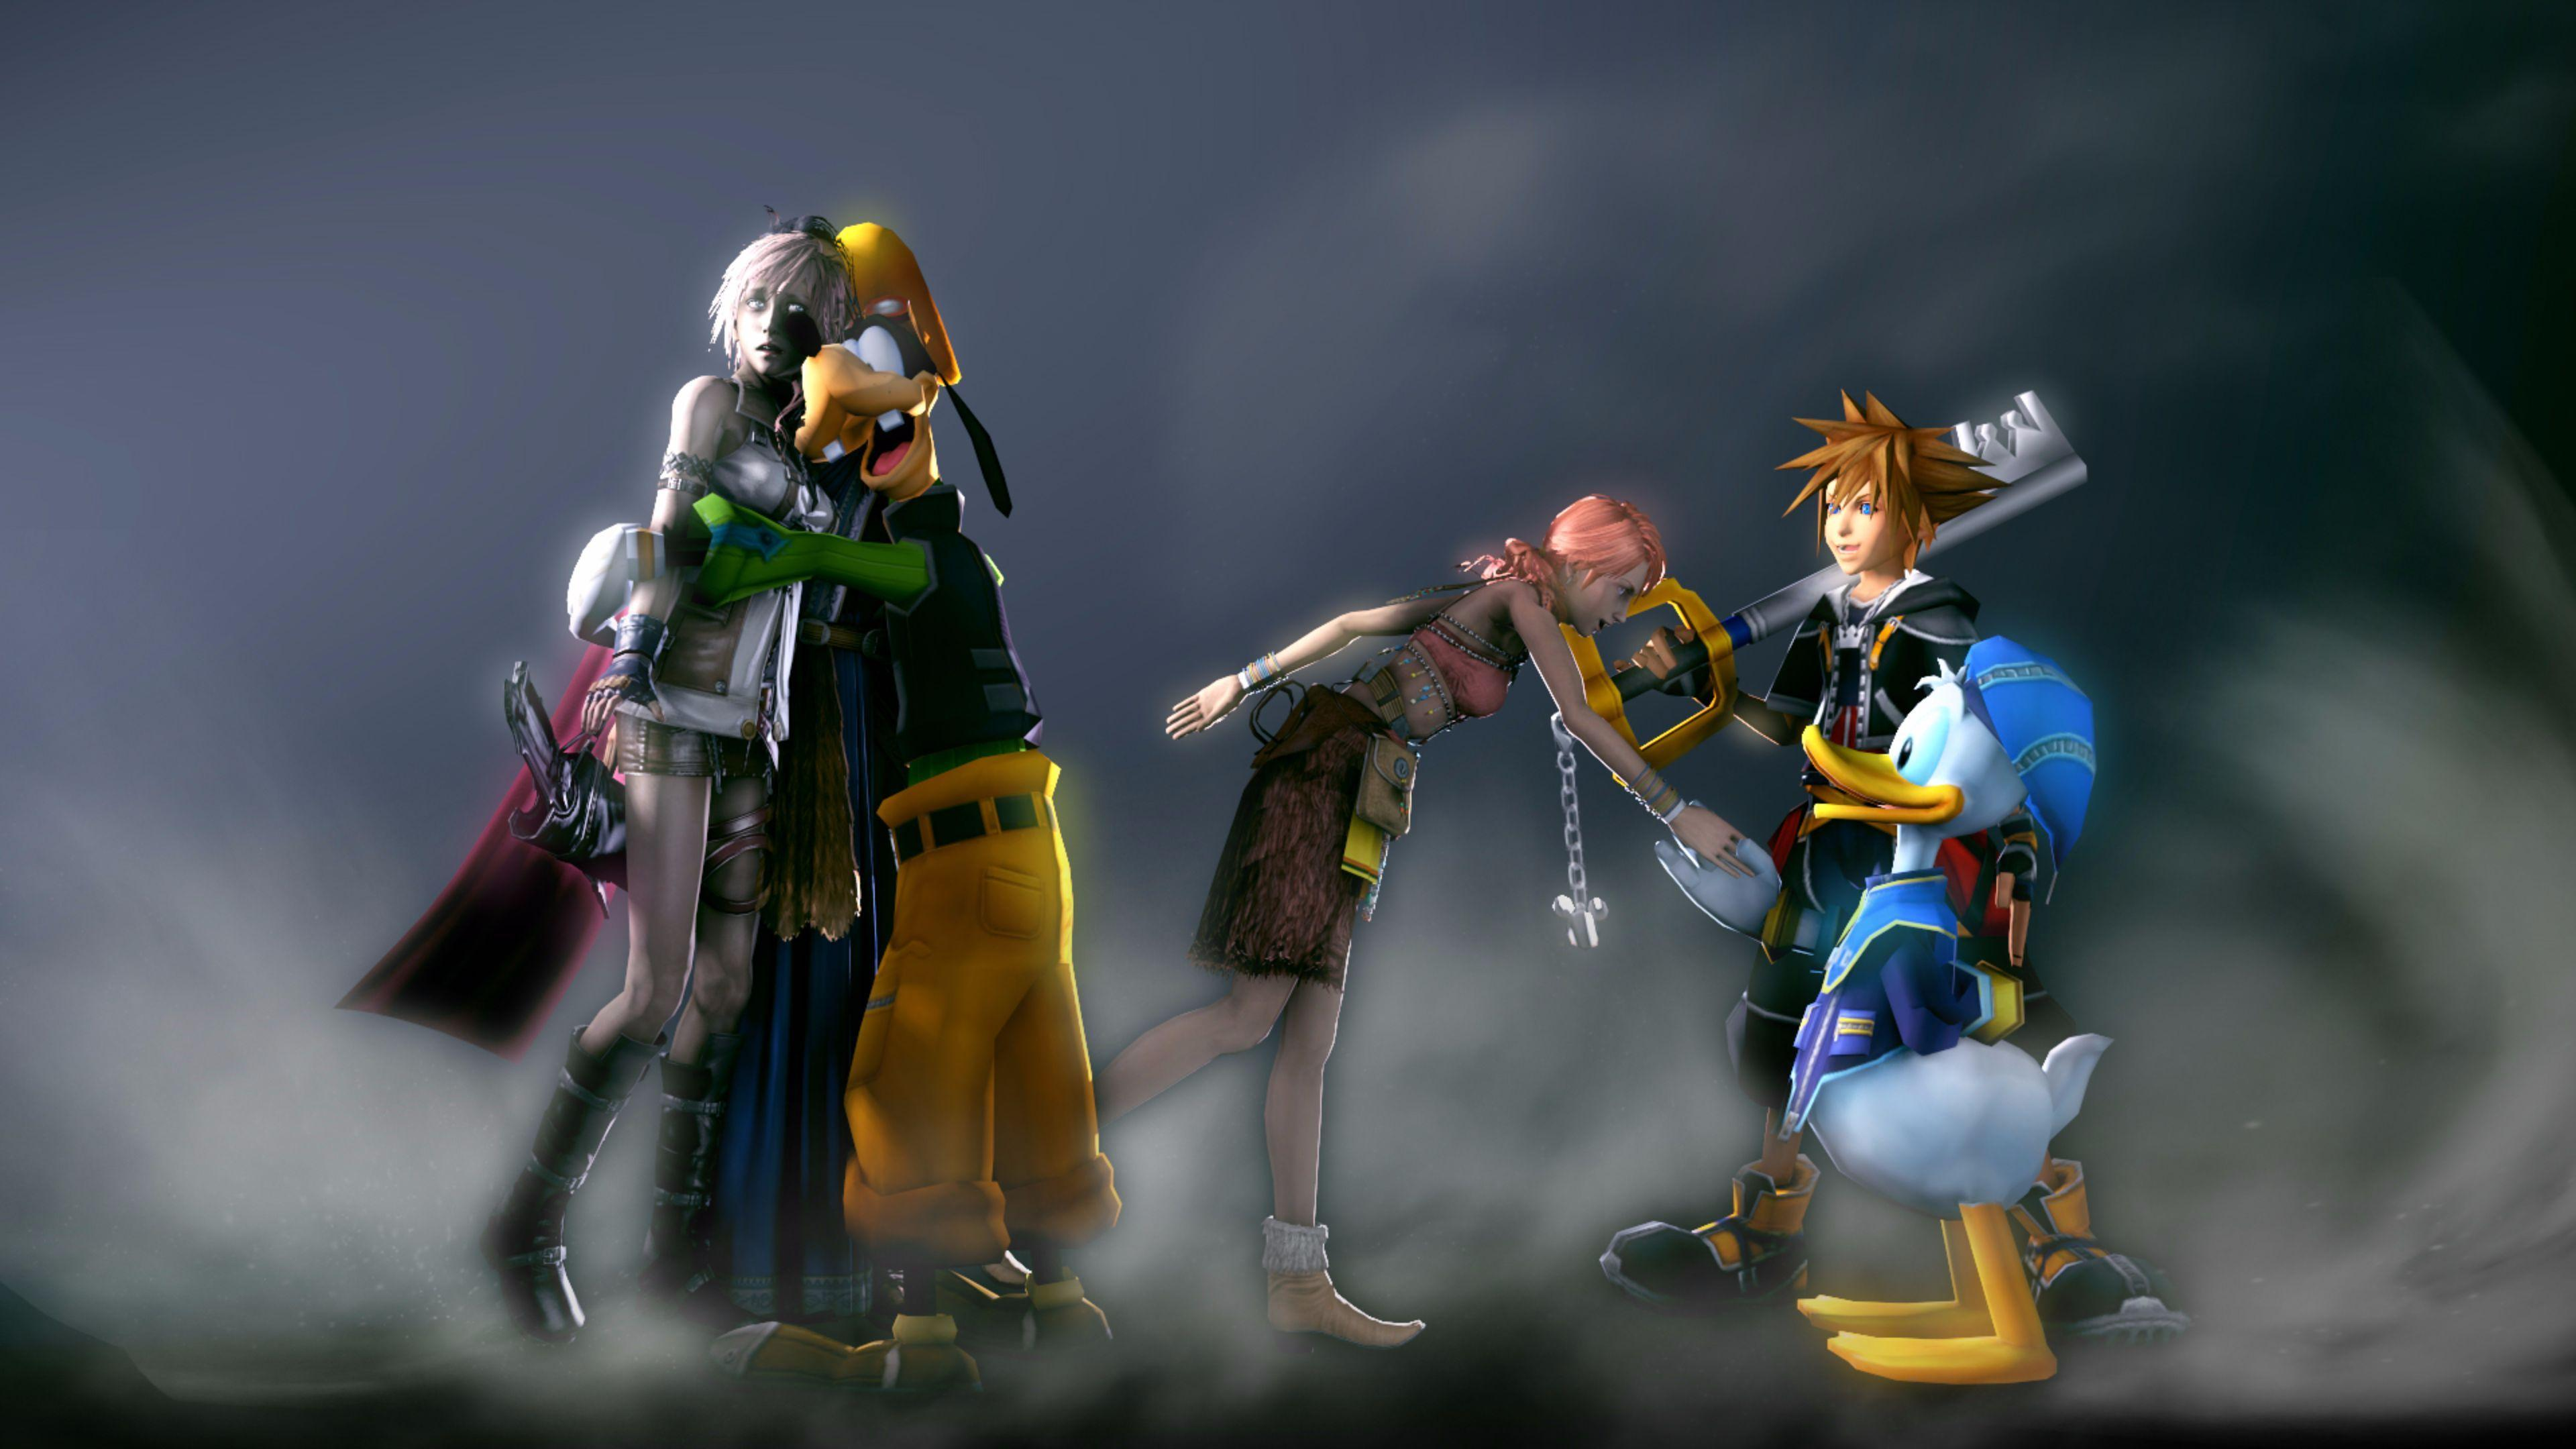 Wallpapers Kingdom Hearts - Wallpaper Cave